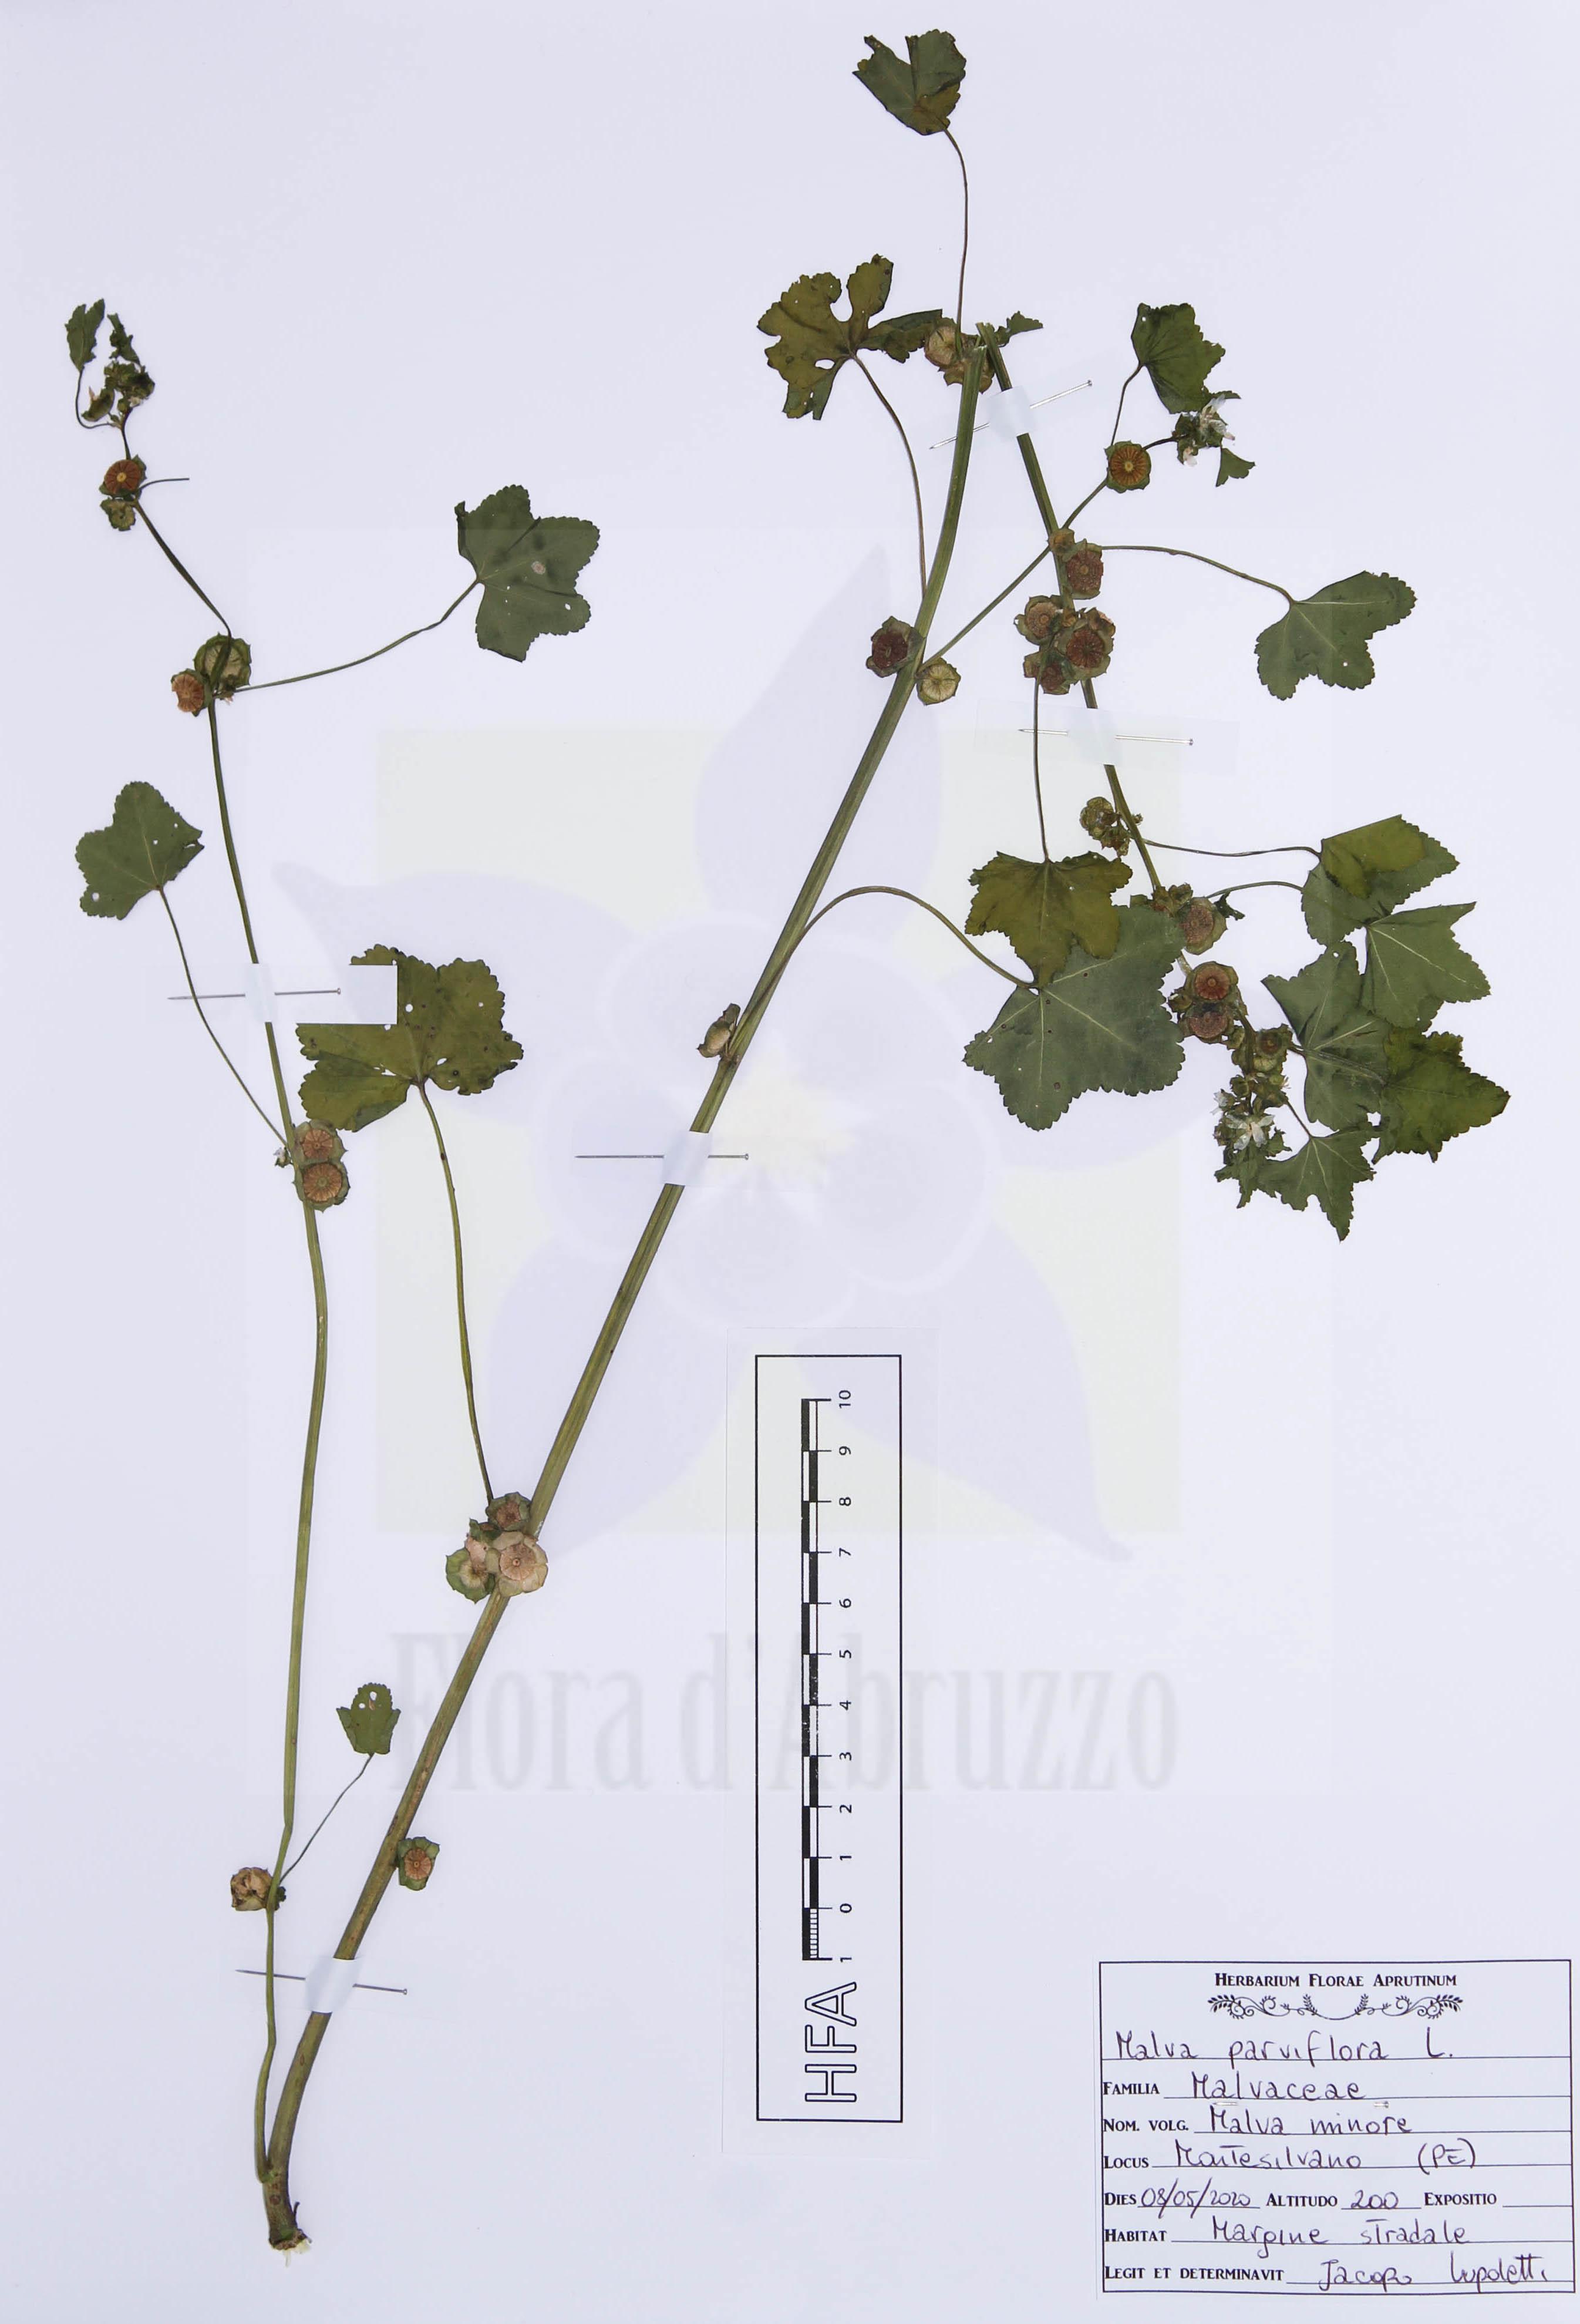 Malva parviflora L.